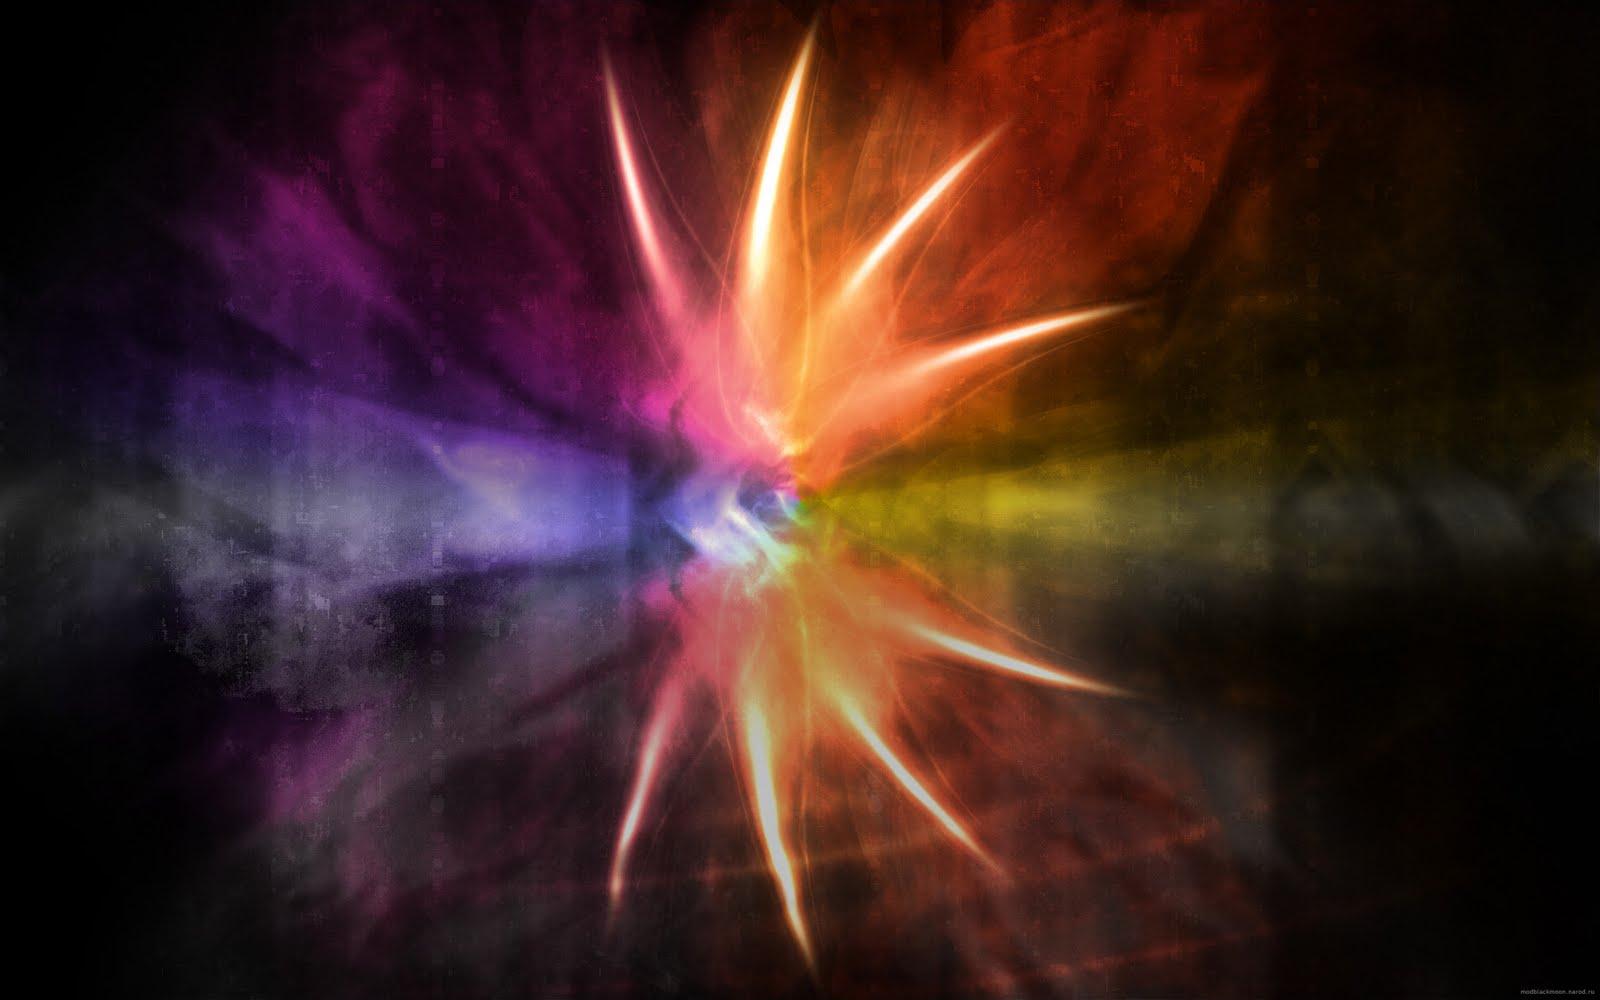 http://3.bp.blogspot.com/-Z93qbC6rI6g/TtxJcVnrIKI/AAAAAAAAArA/RmRB-Q136o0/s1600/rainbow-hd-5-768875.jpg